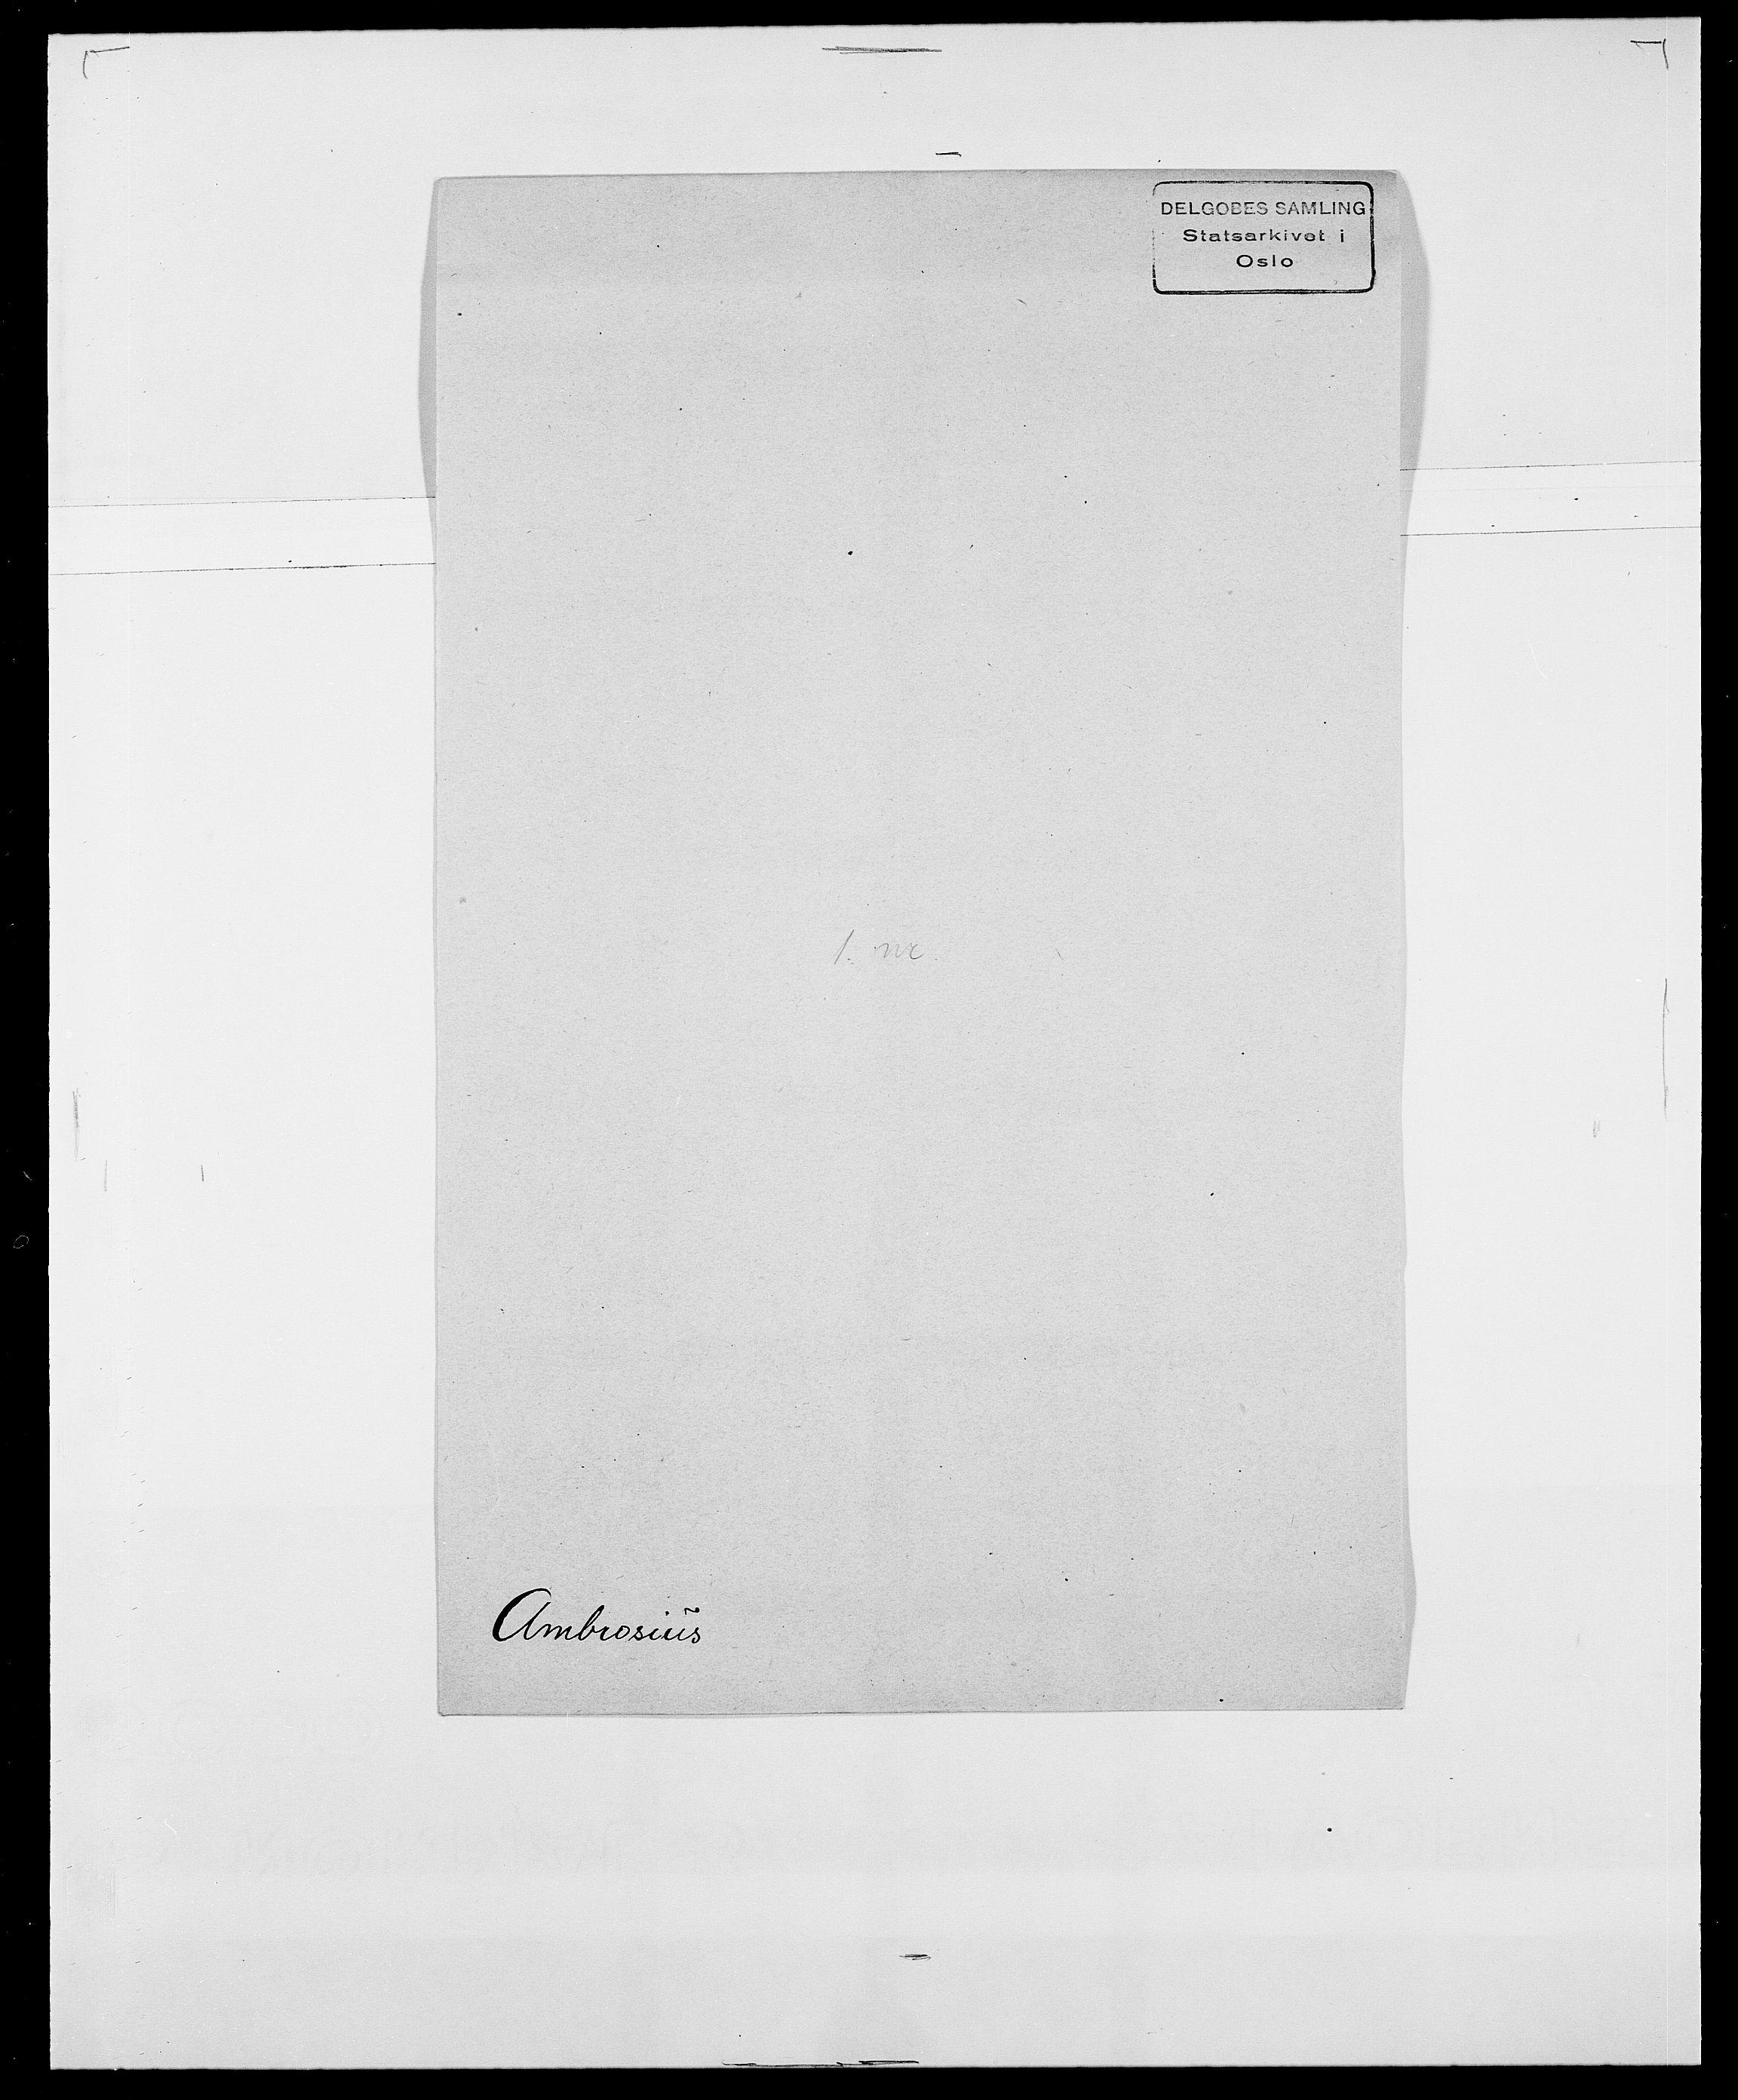 SAO, Delgobe, Charles Antoine - samling, D/Da/L0001: Aabye - Angerman, s. 527